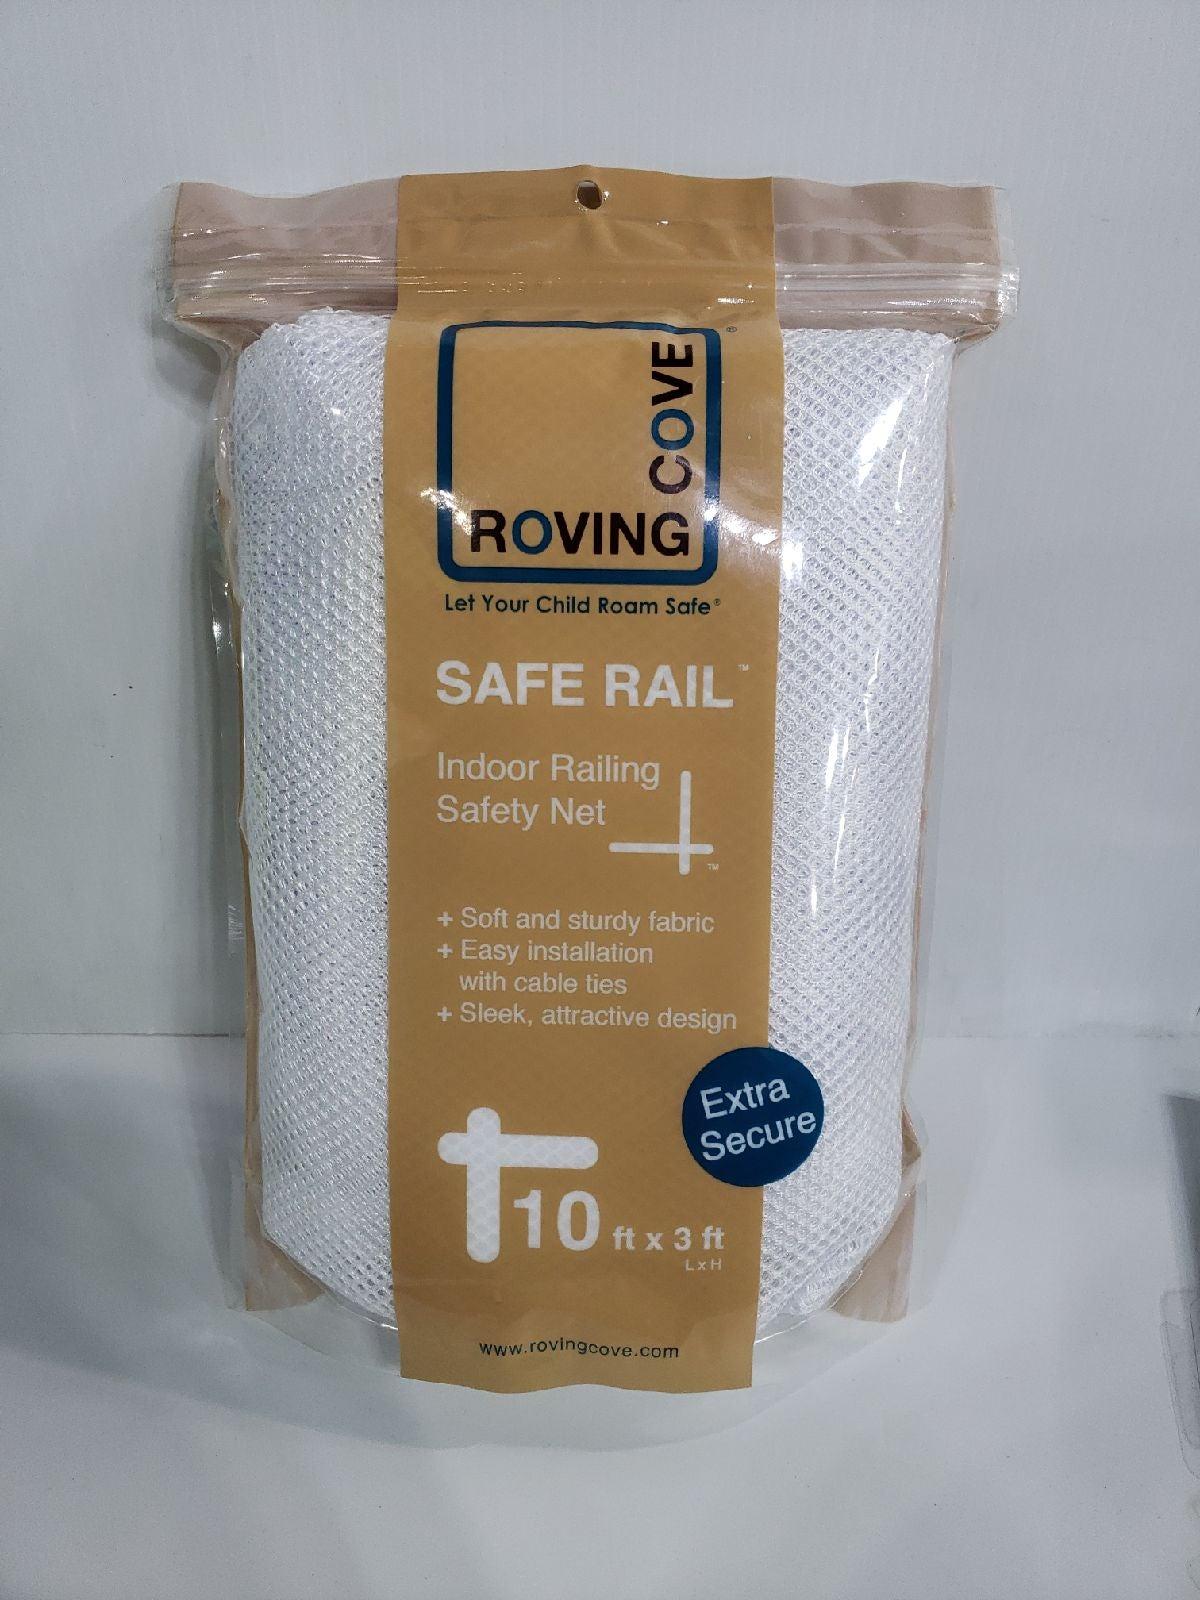 Safe Rail Indoor Railing Safety Net